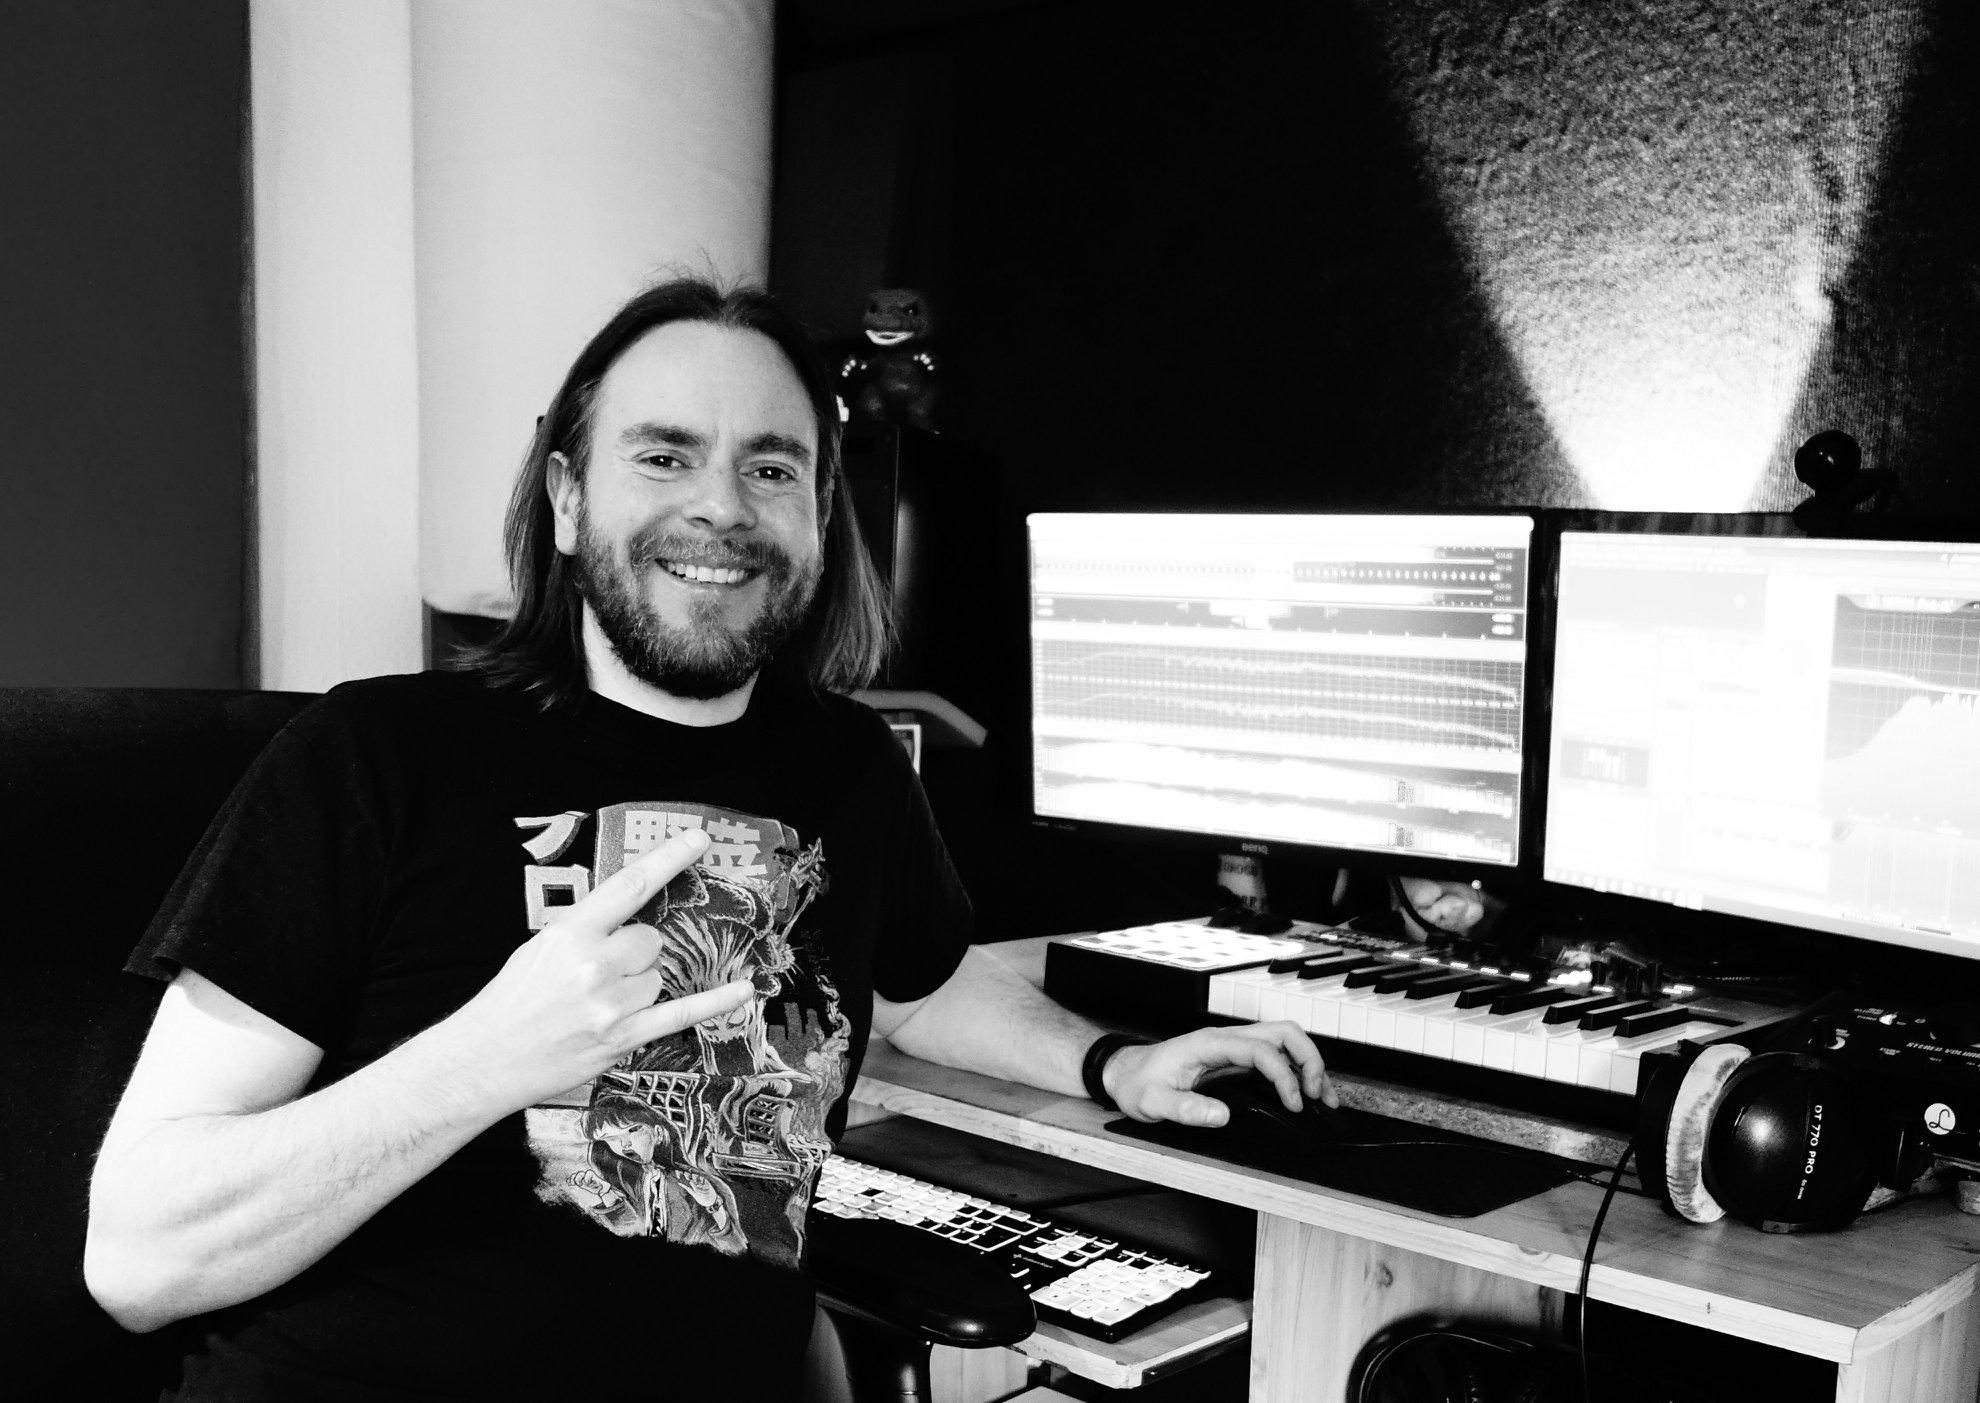 Dennis-Koehne-Mastermg-Studio